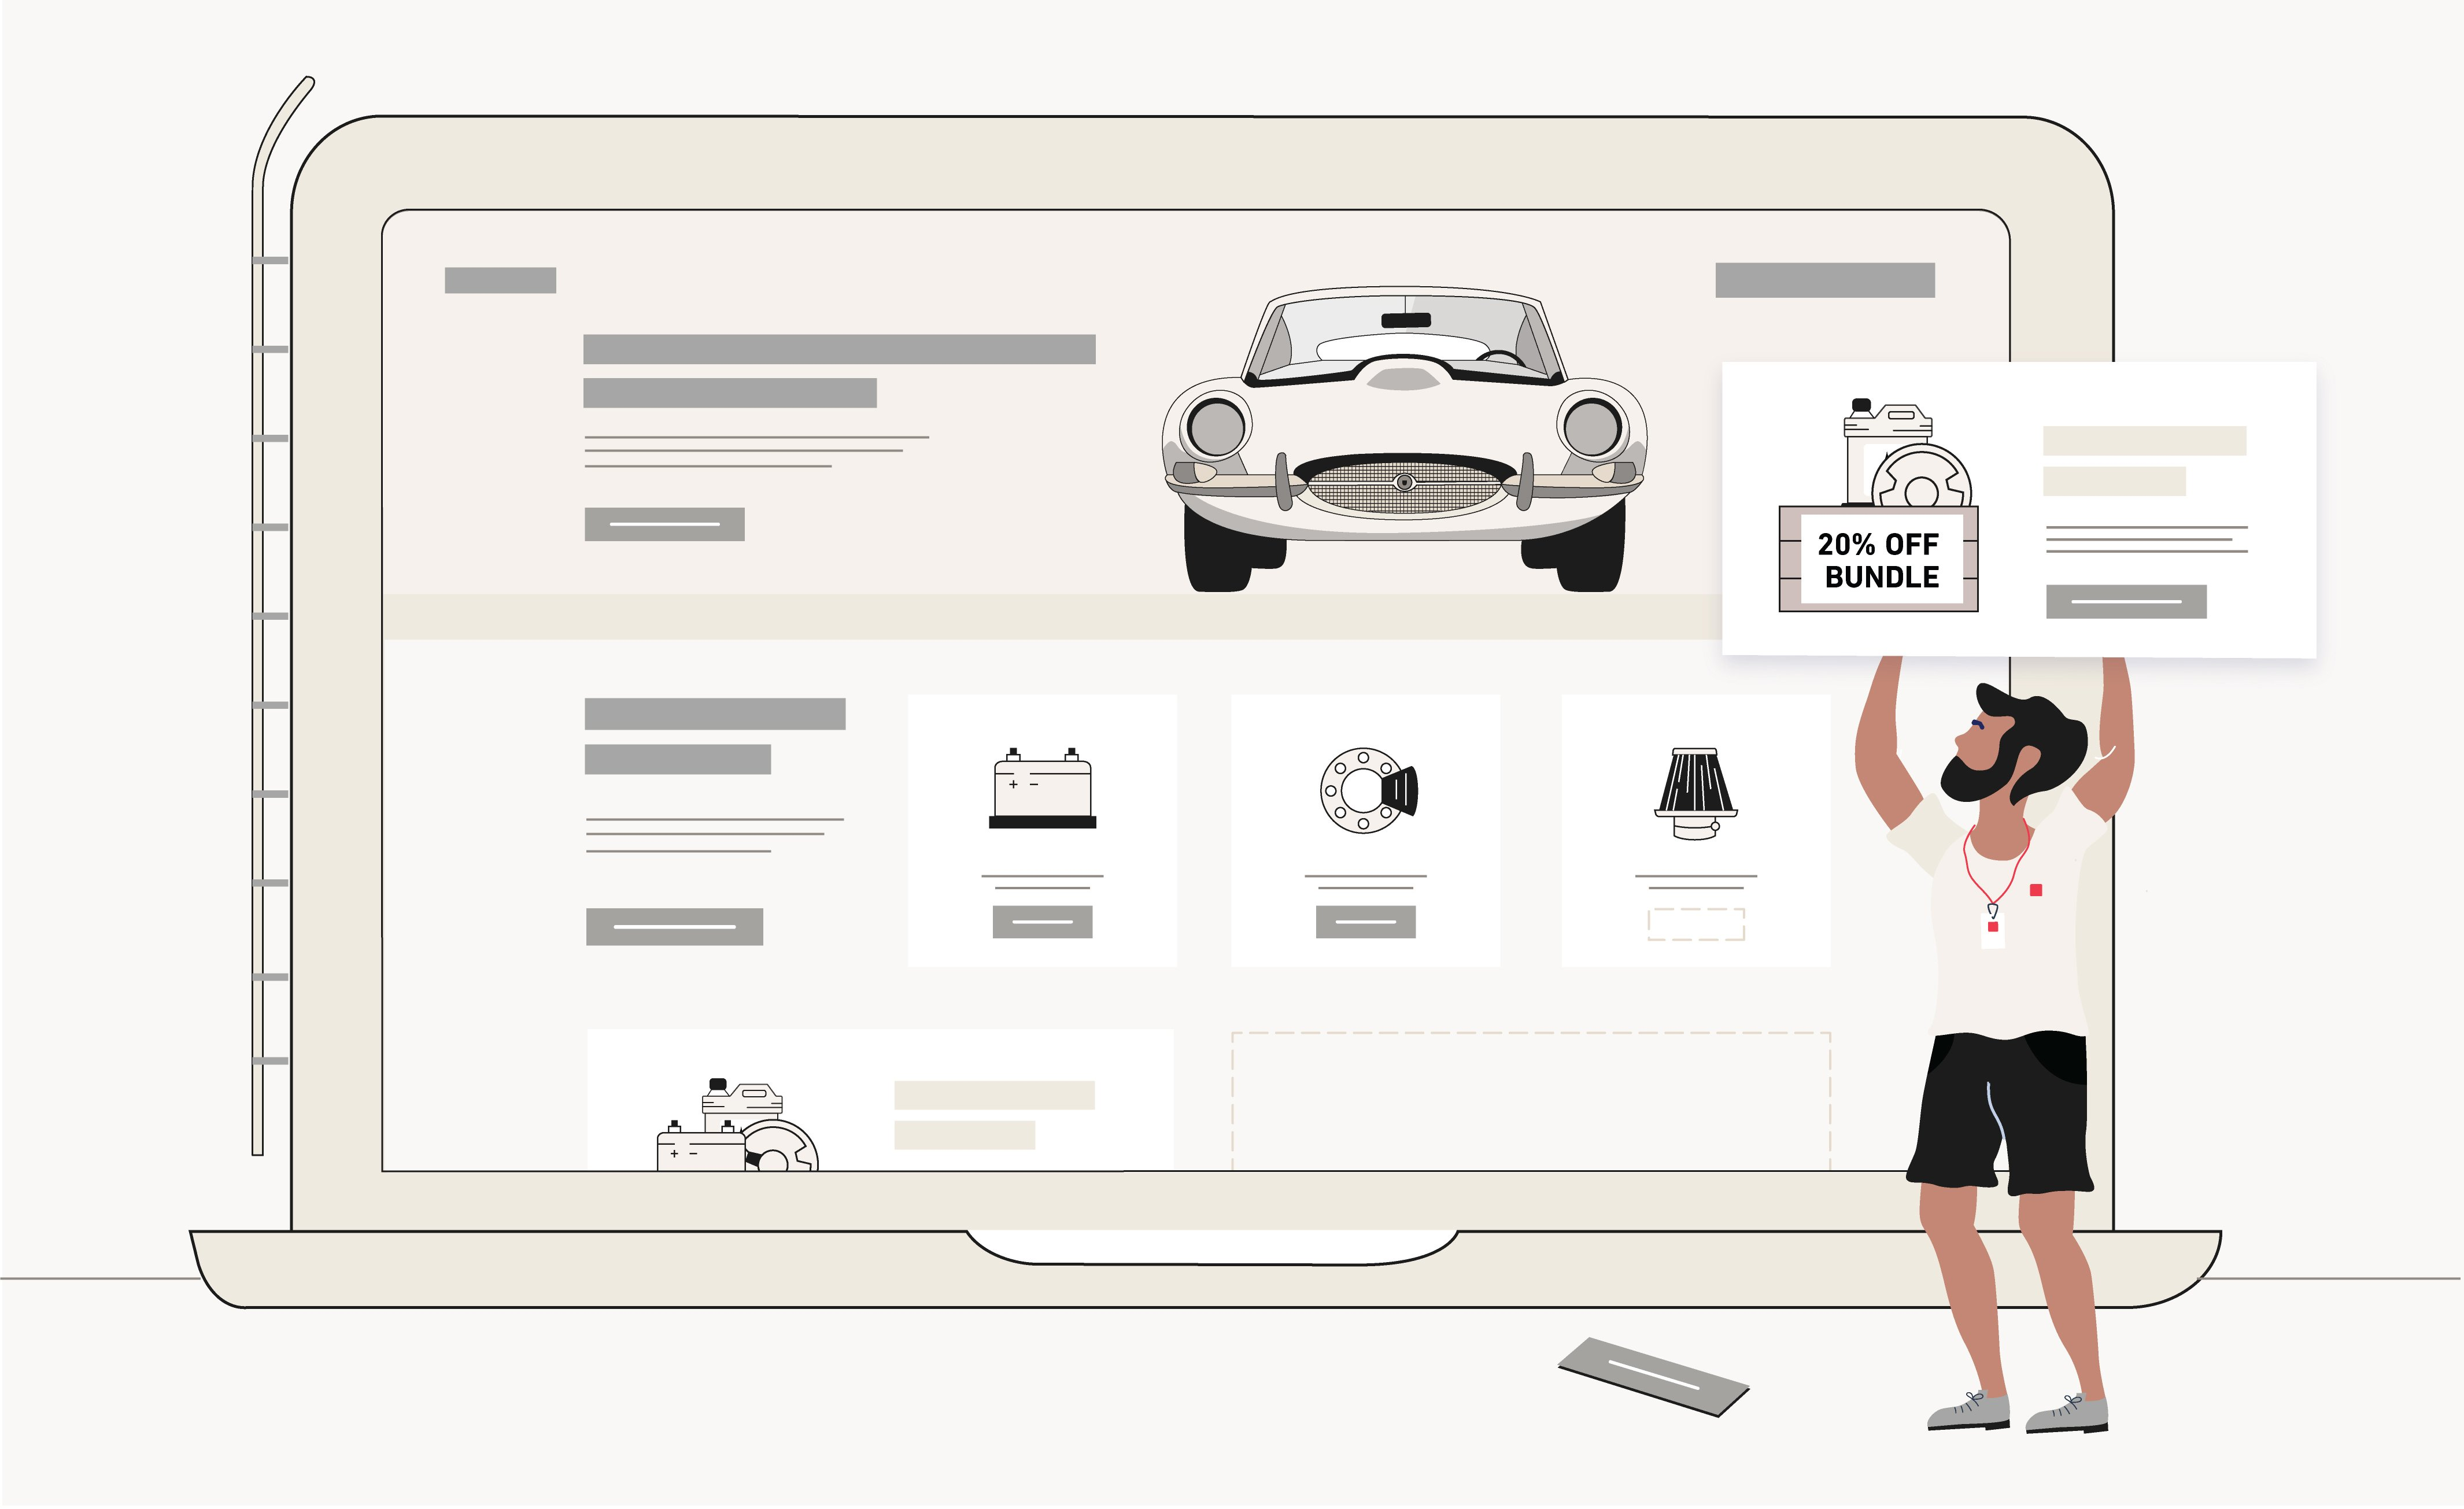 Ecommerce platform illustration